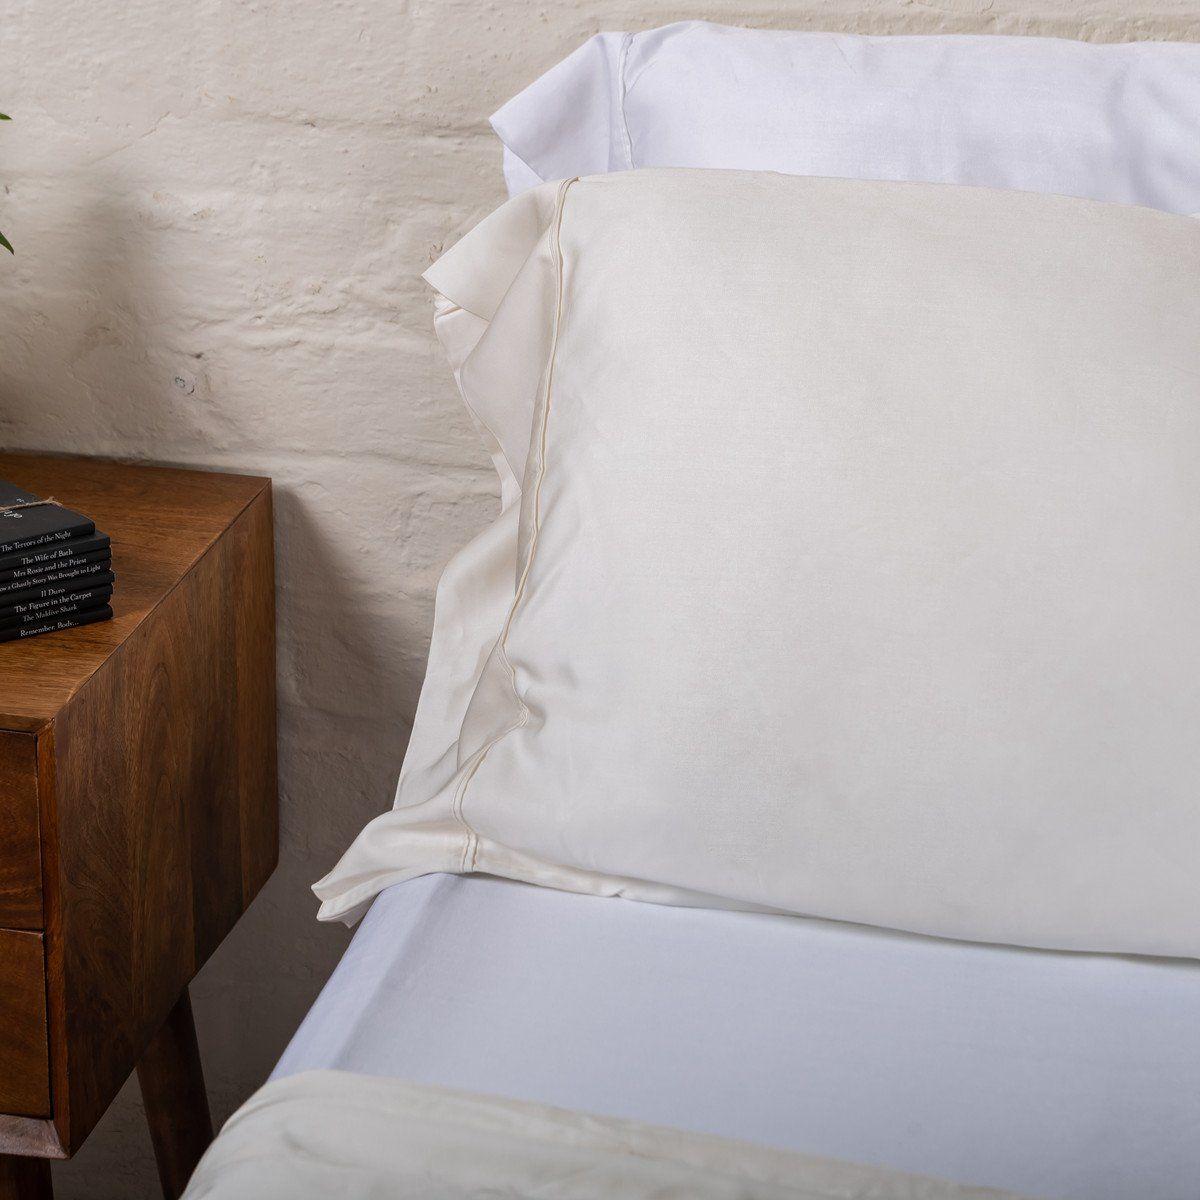 100 Organic Bamboo Sheet Sets Bamboo Bedding Linenly Bamboo Pillowcase Bamboo Sheets Bamboo Sheets Bedding